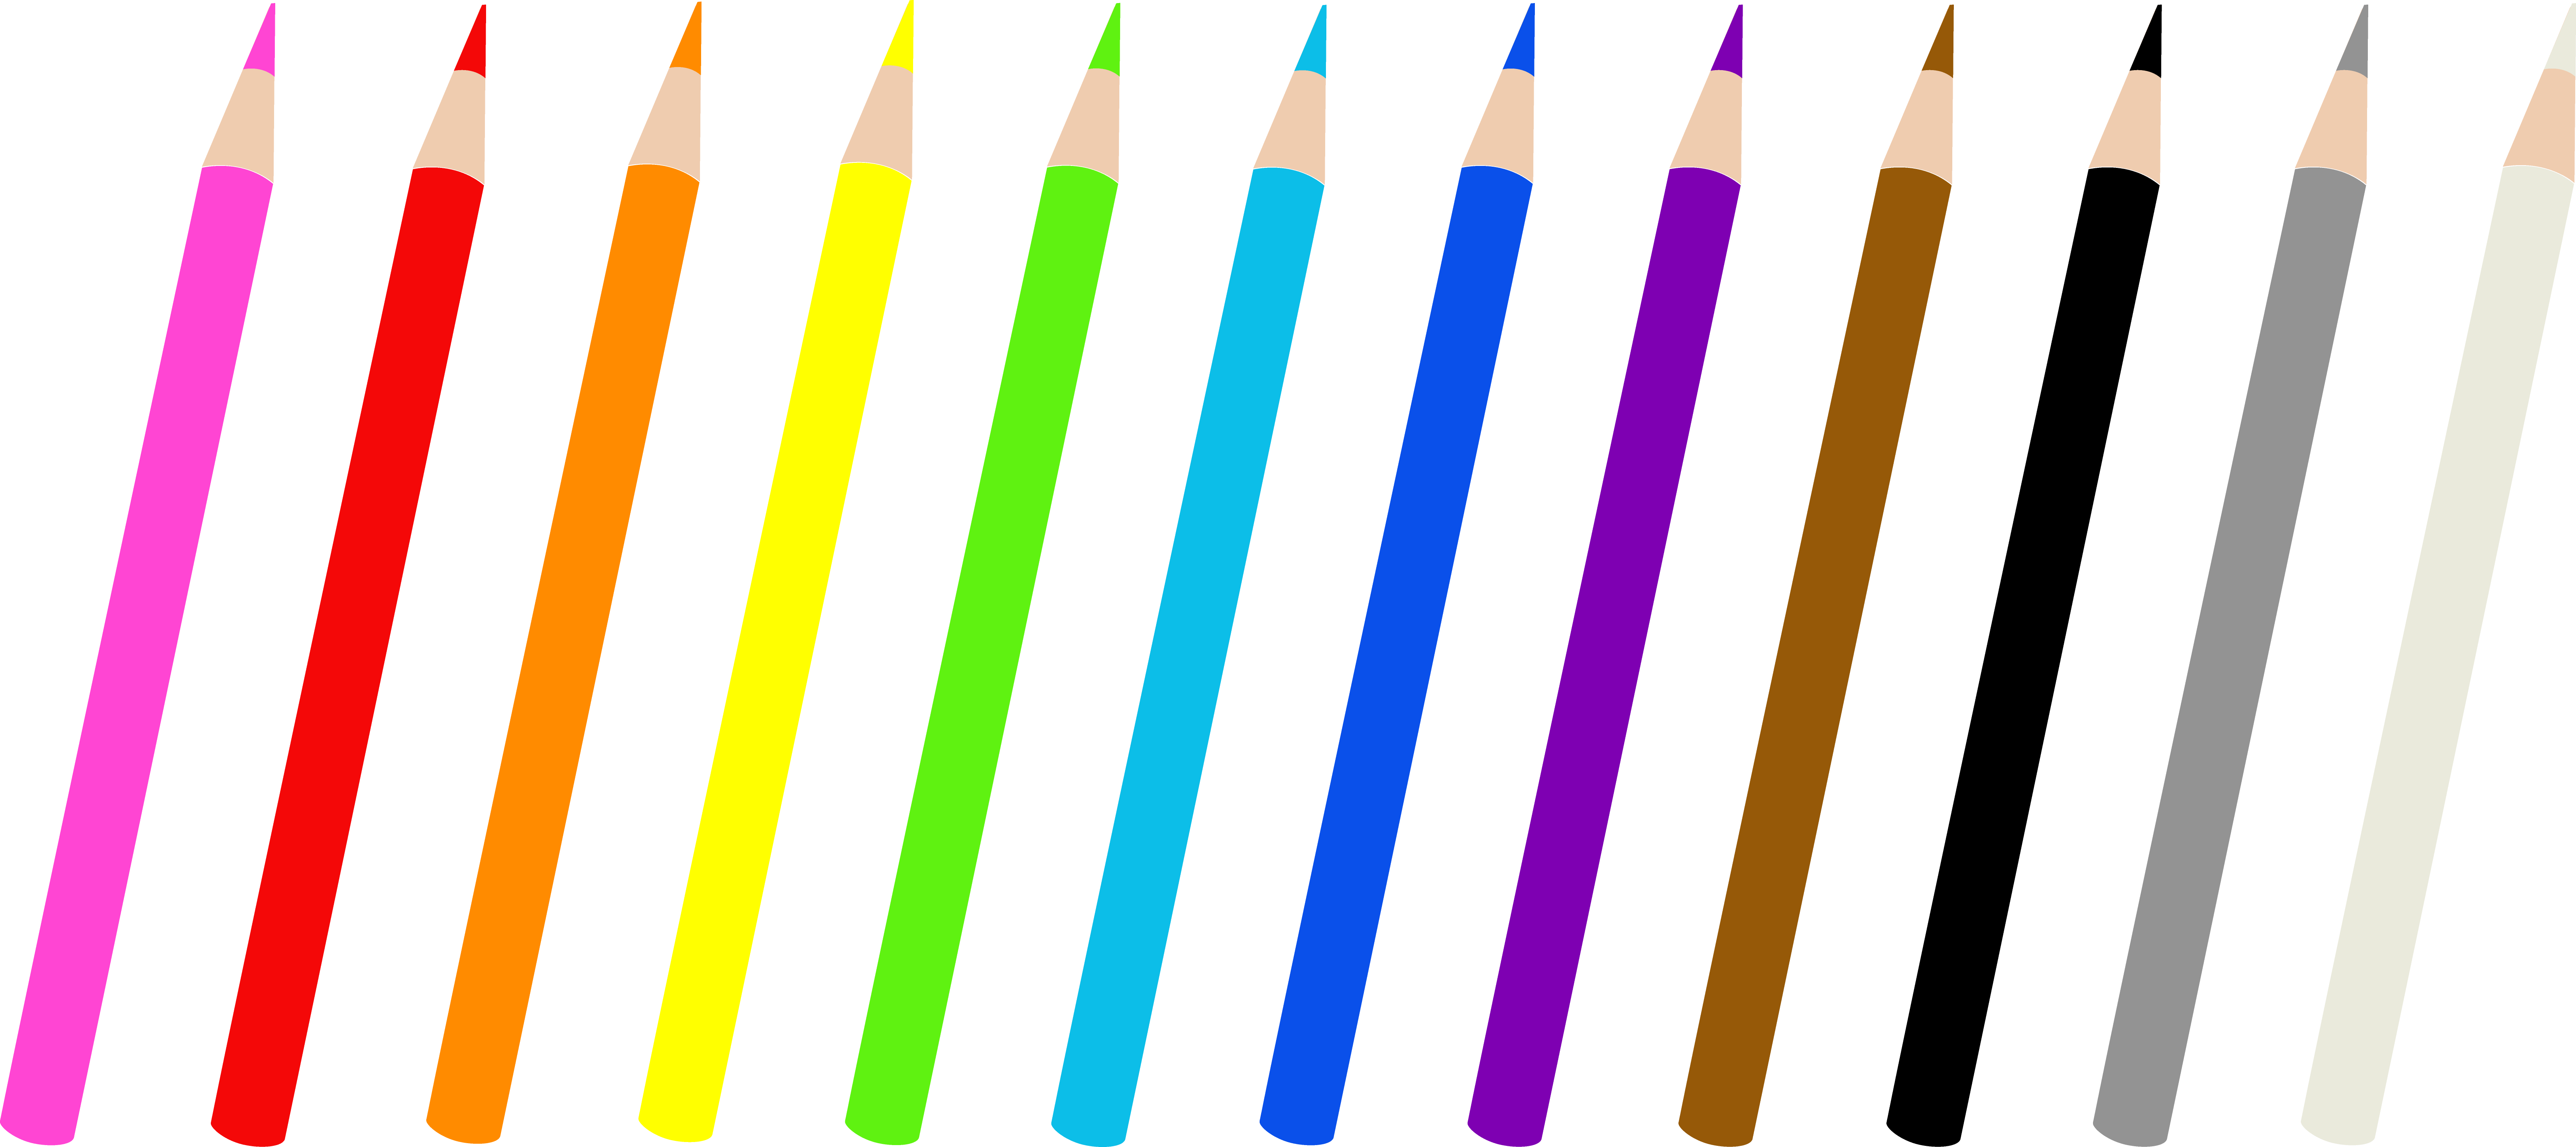 6720x2993 Set Of Twelve Colored Pencils